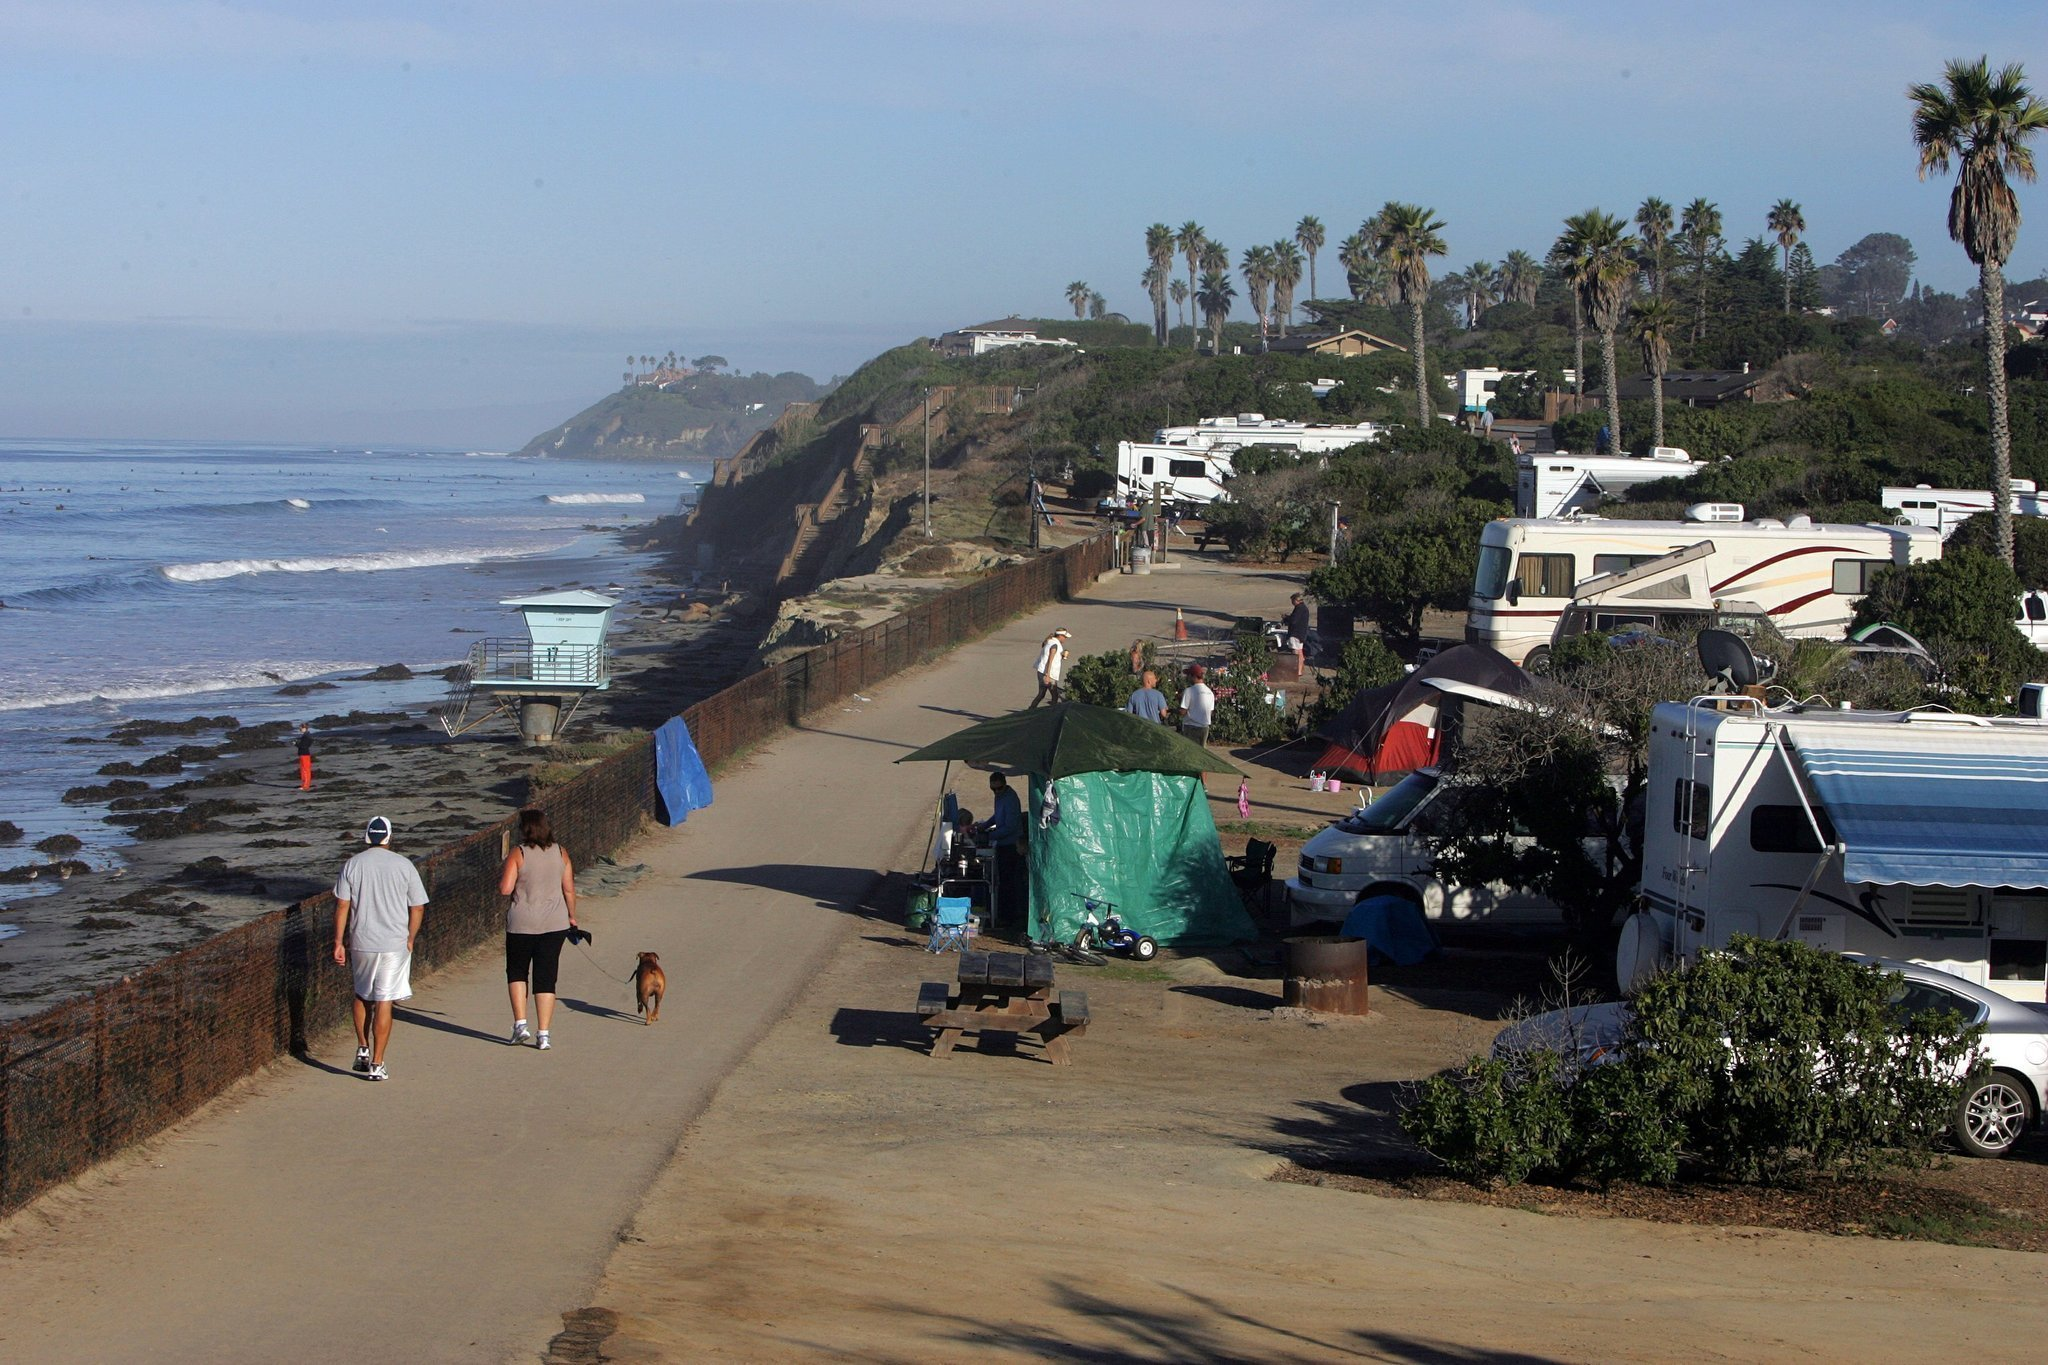 Beach Tent Camping San Diego Ca